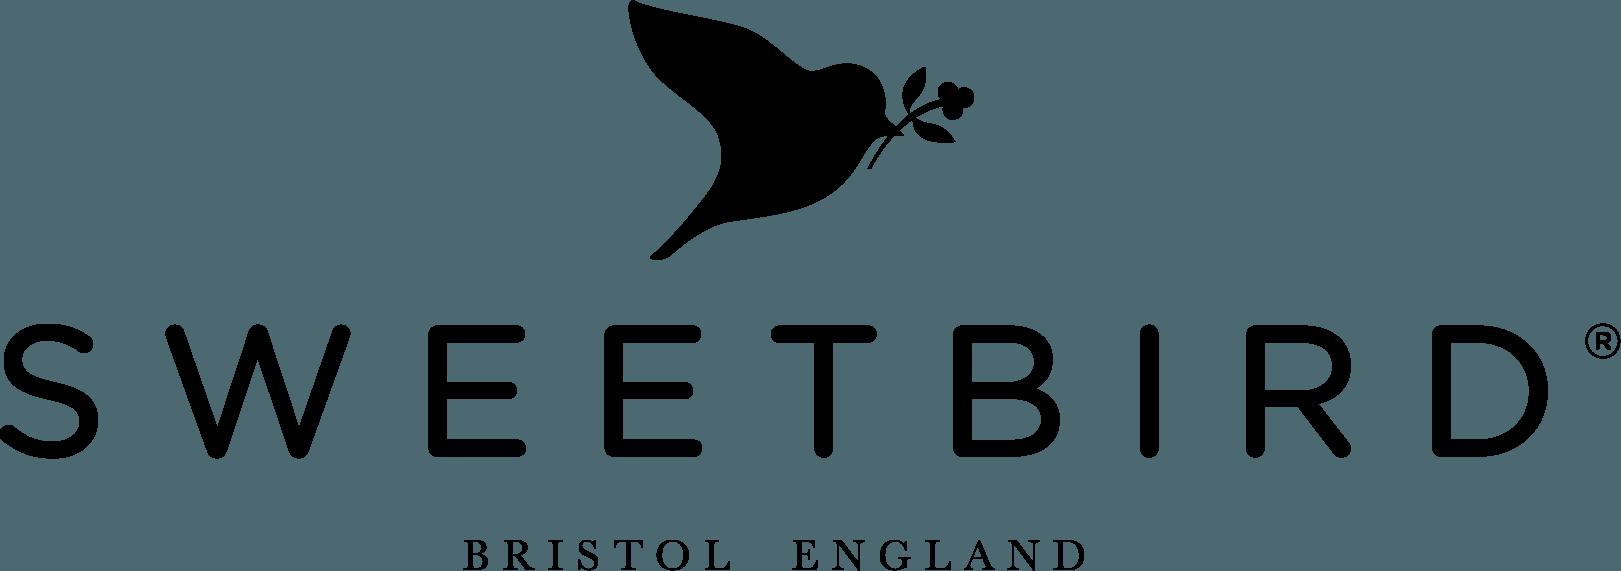 sweetbird bristol